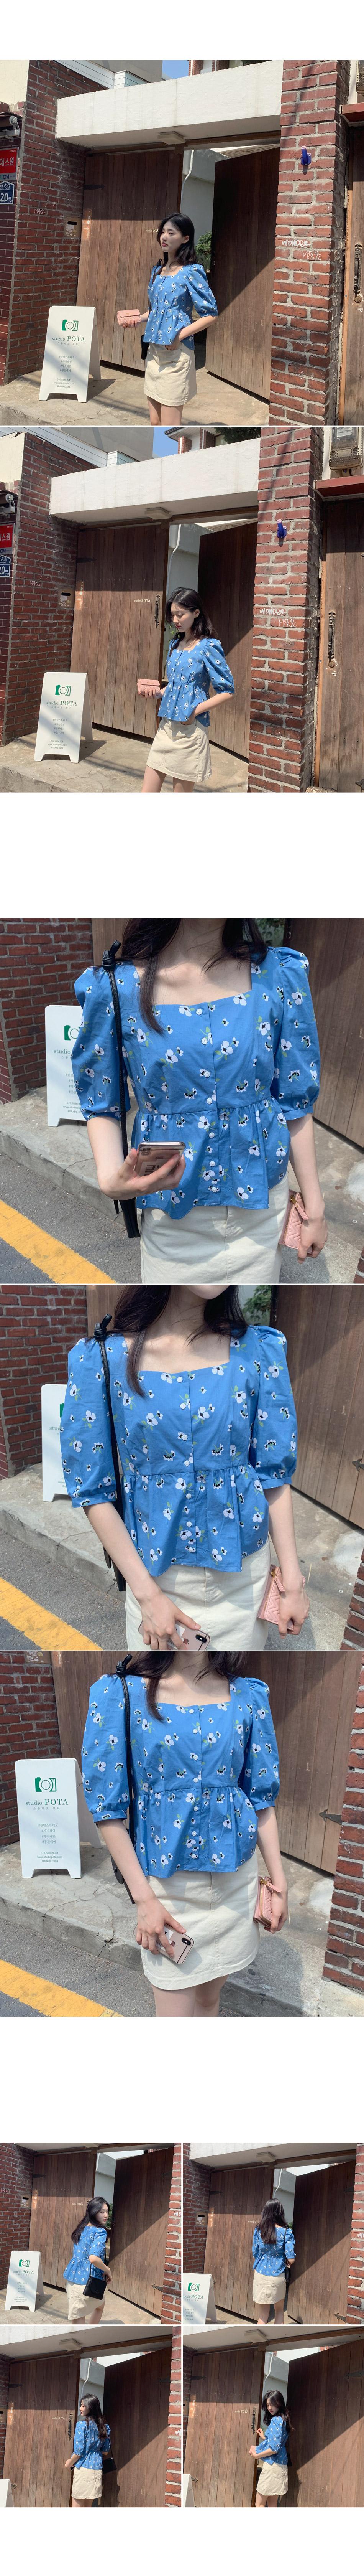 Jude floral blouse _Y